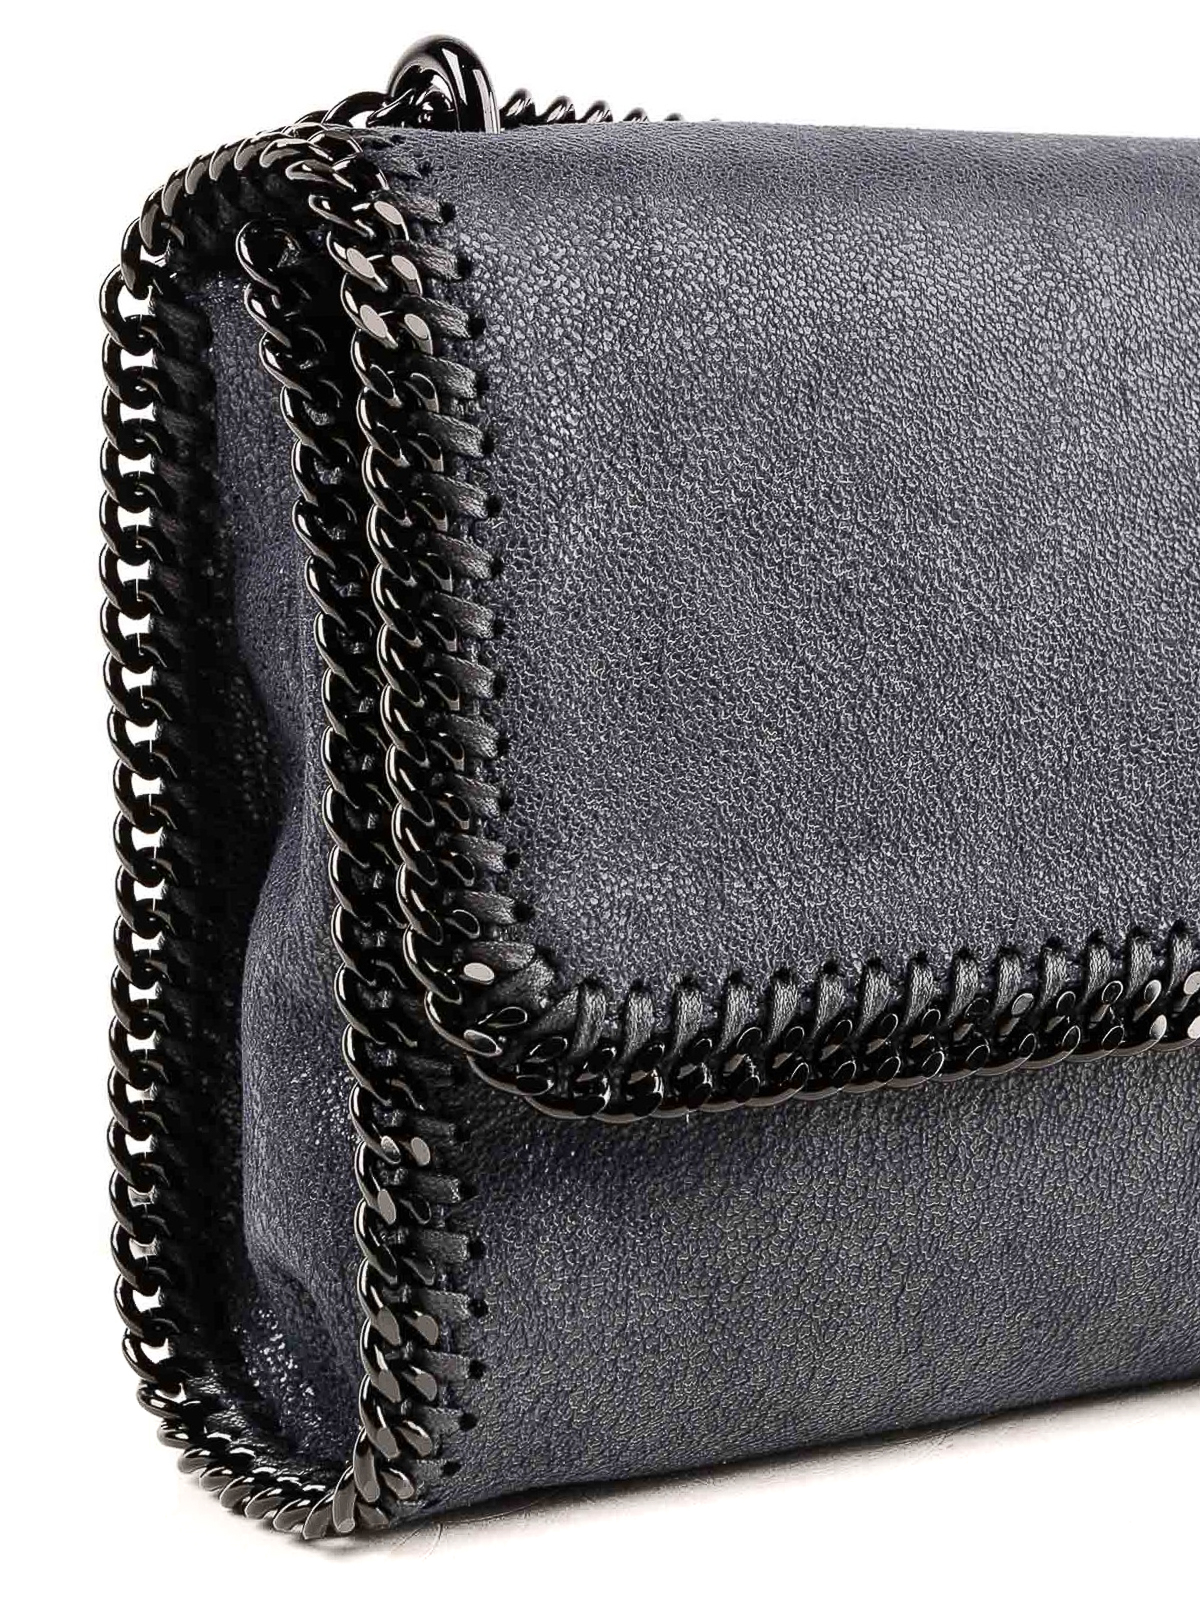 Falabella navy shaggy deer shoulder bag shop online  STELLA McCARTNEY e23b9593e1f6c